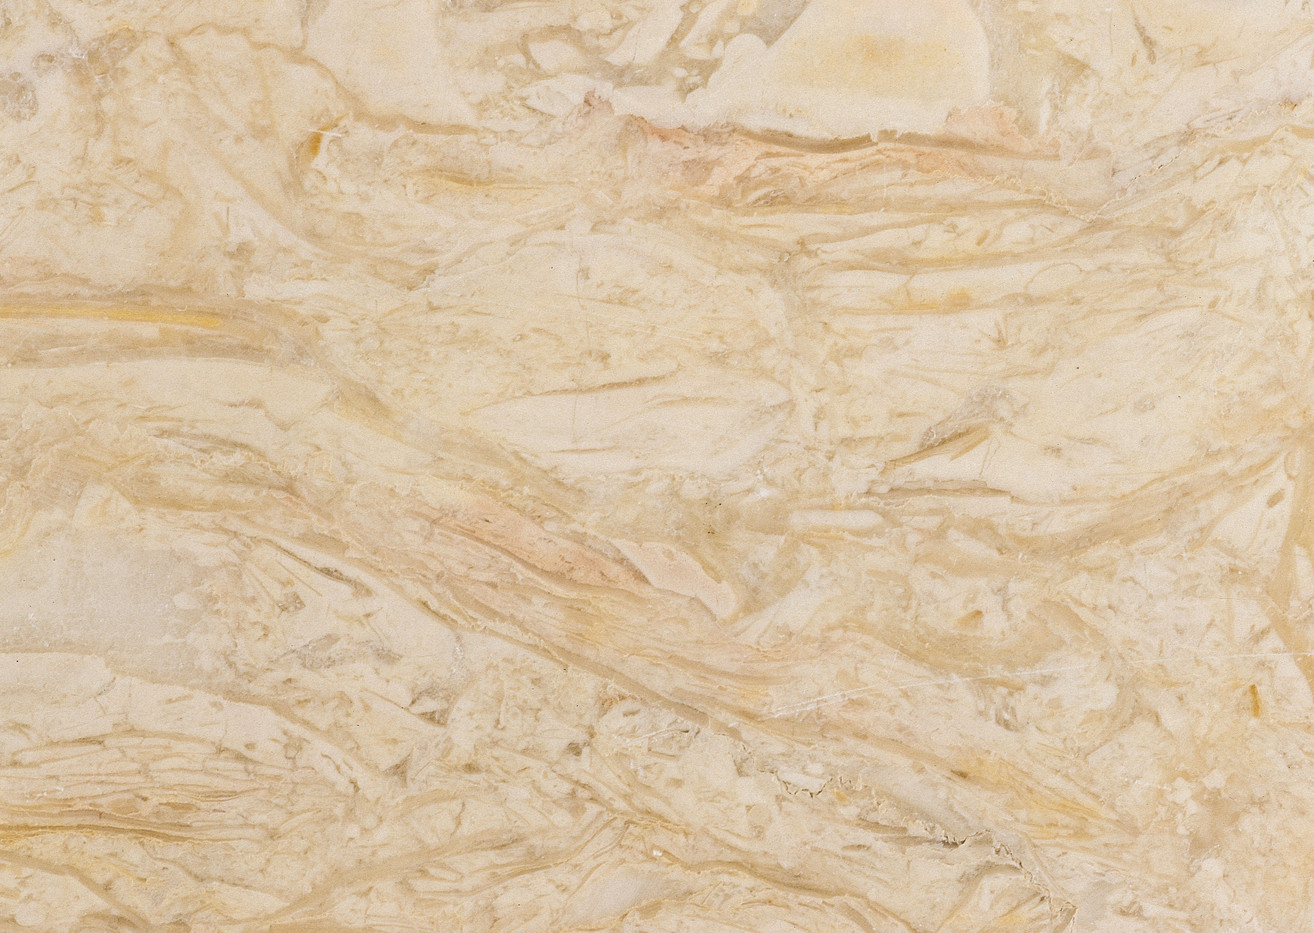 marble_texture4616.jpg